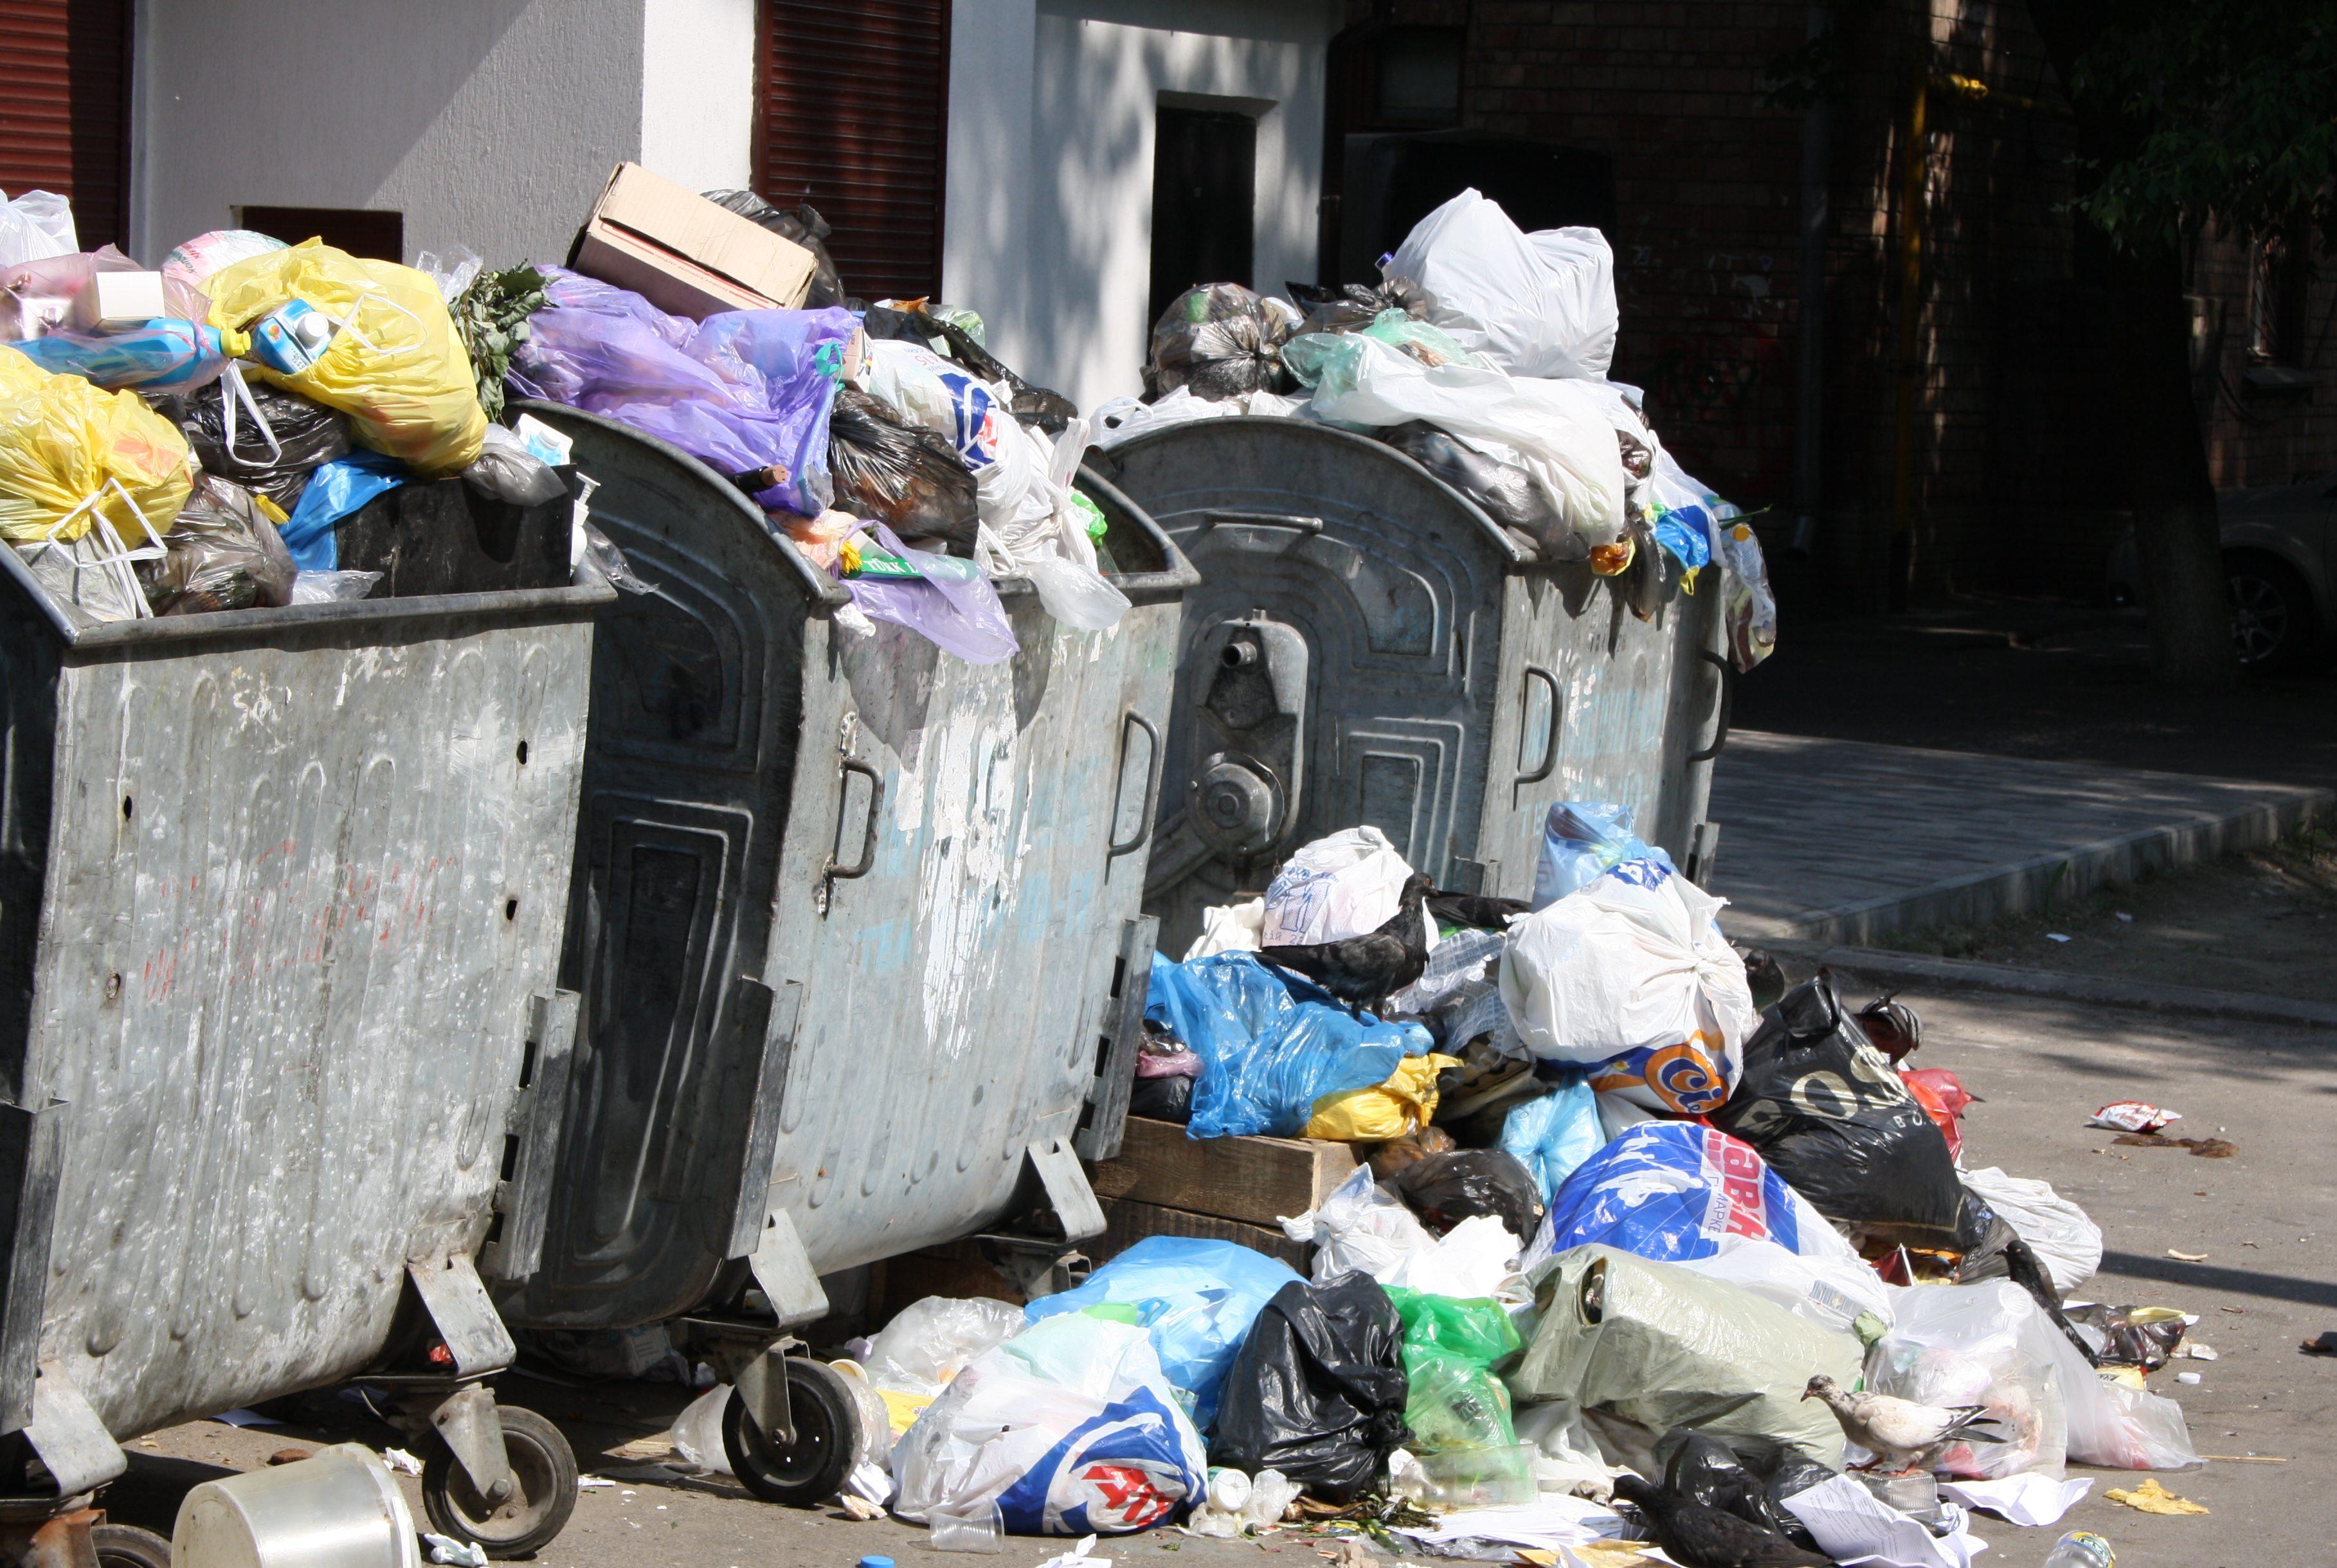 Львівське сміття